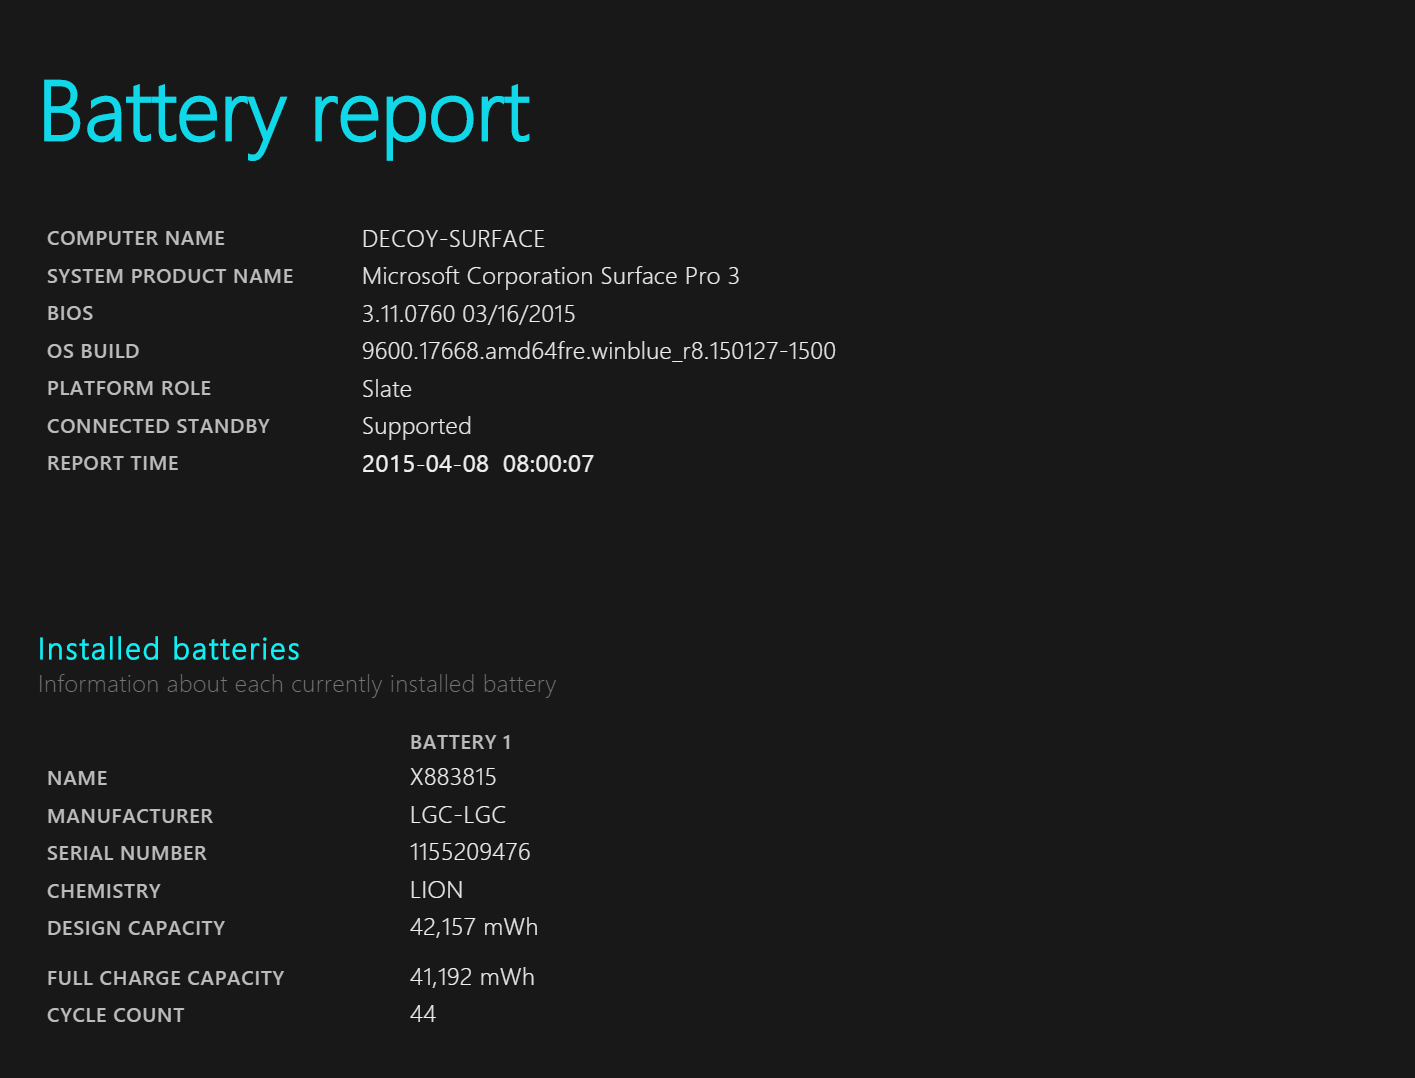 Battery report